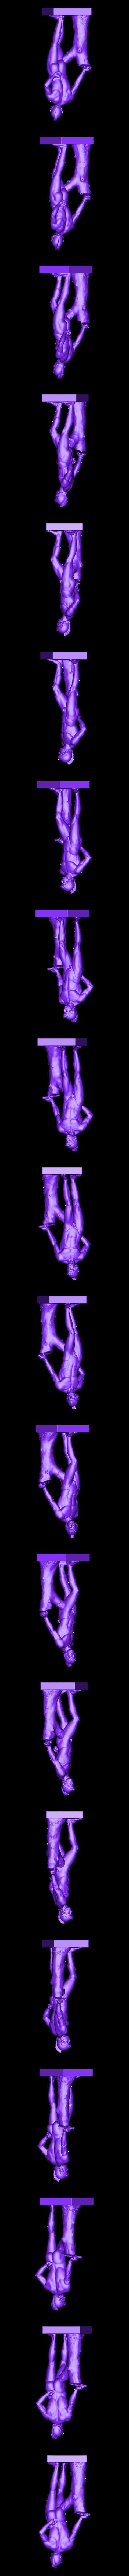 Mars.stl Download free STL file Mars • 3D printable model, ThreeDScans